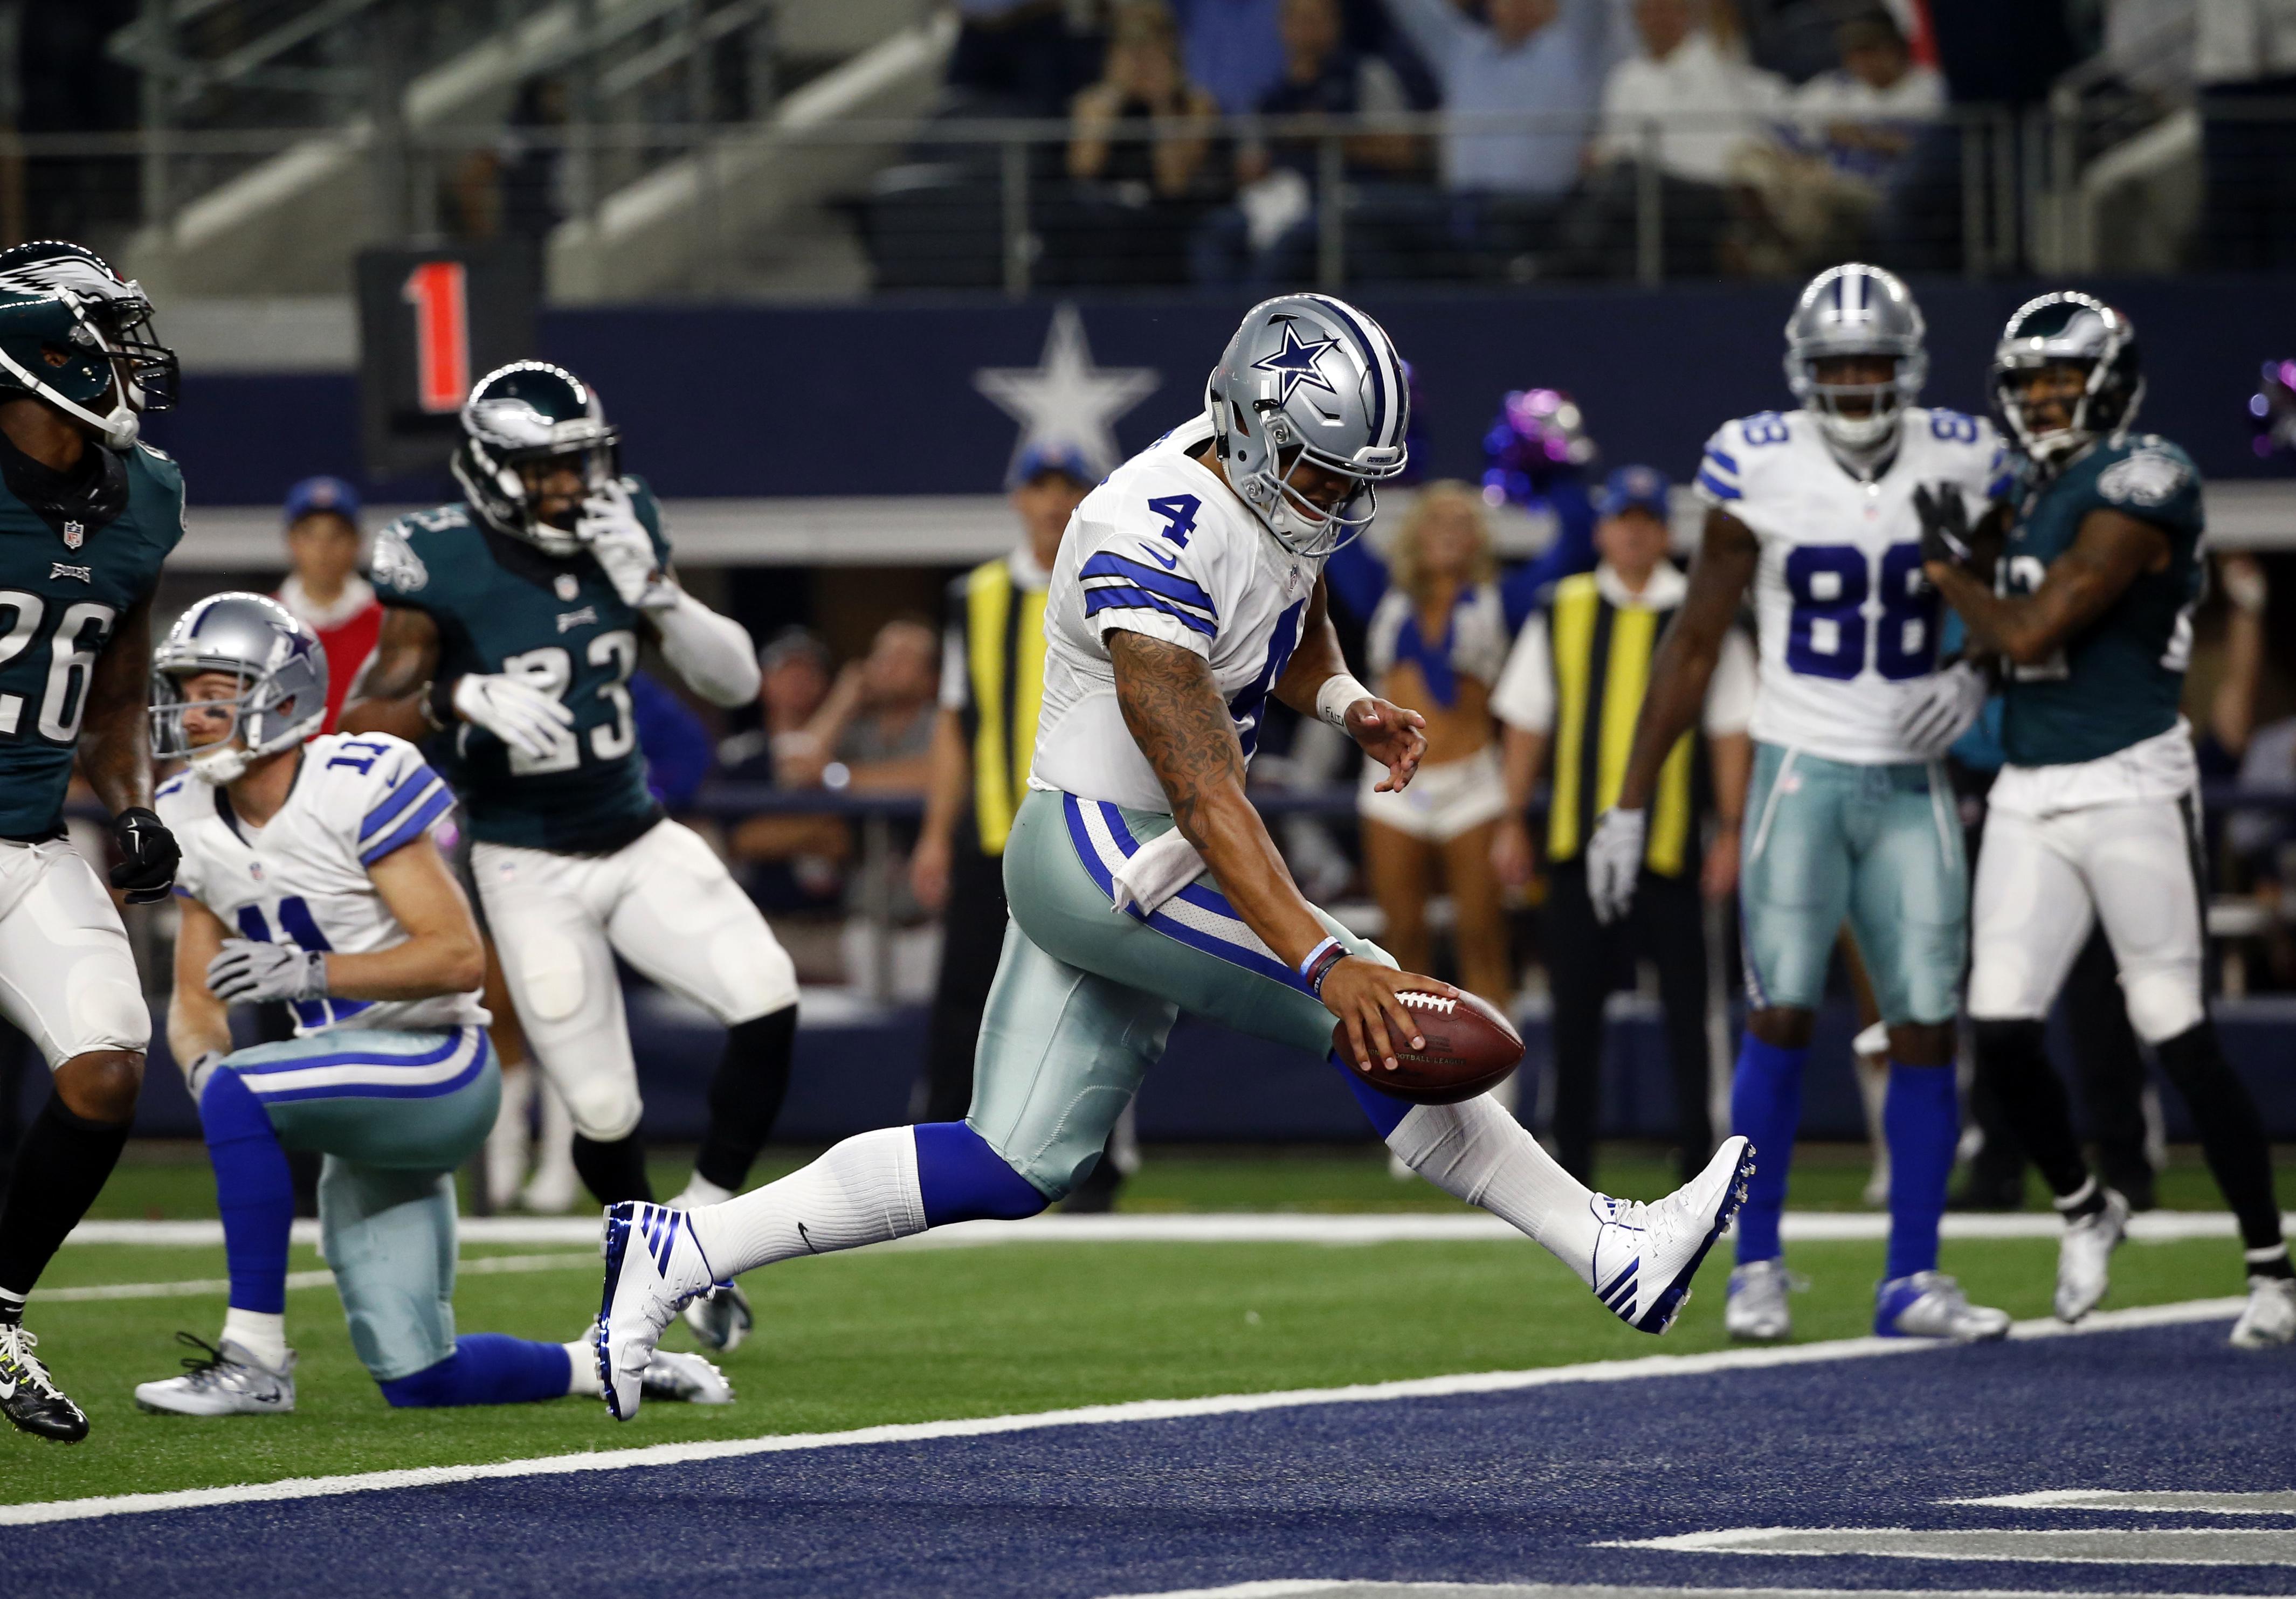 FILE - In this Sunday, Oct. 30, 2016, file photo, Dallas Cowboys quarterback Dak Prescott (4) runs the ball for a touchdown against the Philadelphia Eagles in the first half of an NFL football game in Arlington, Texas.  As Dallas rookie quarterback's winn